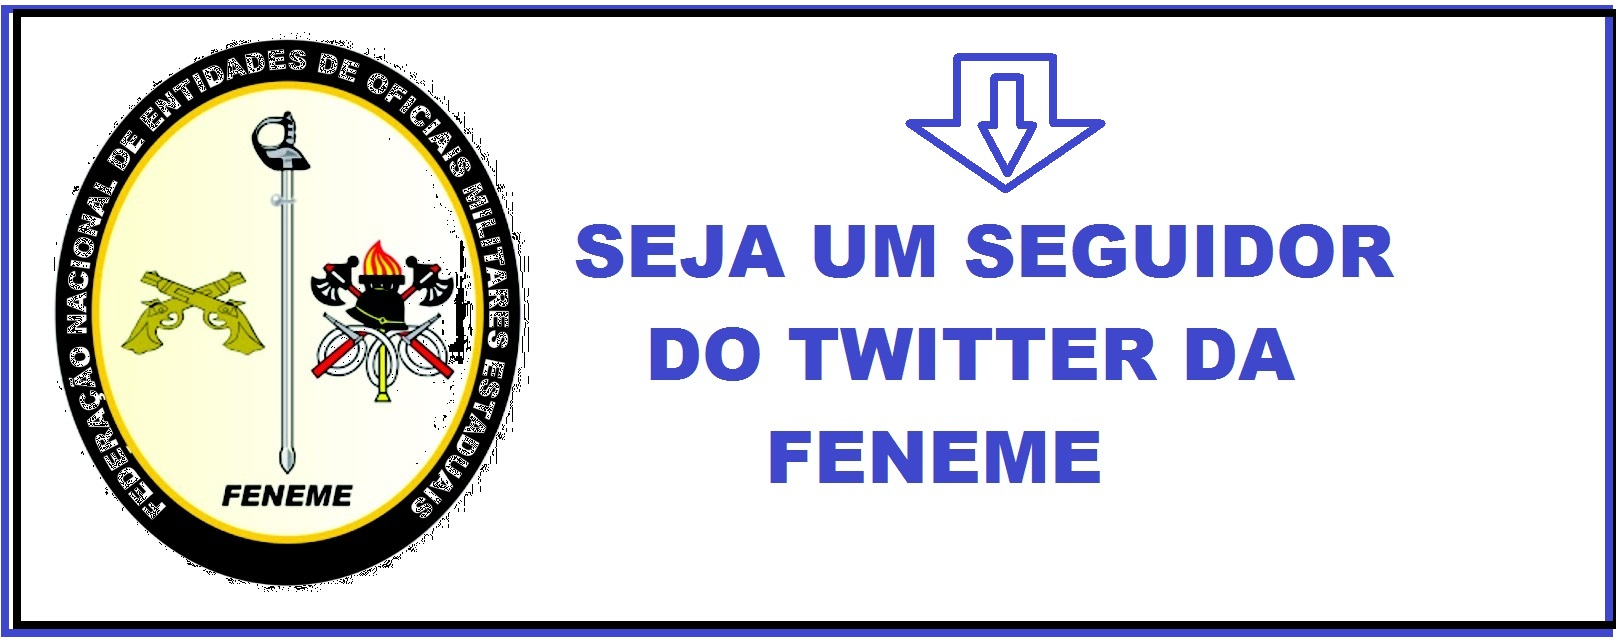 TWITTER DA FENEME